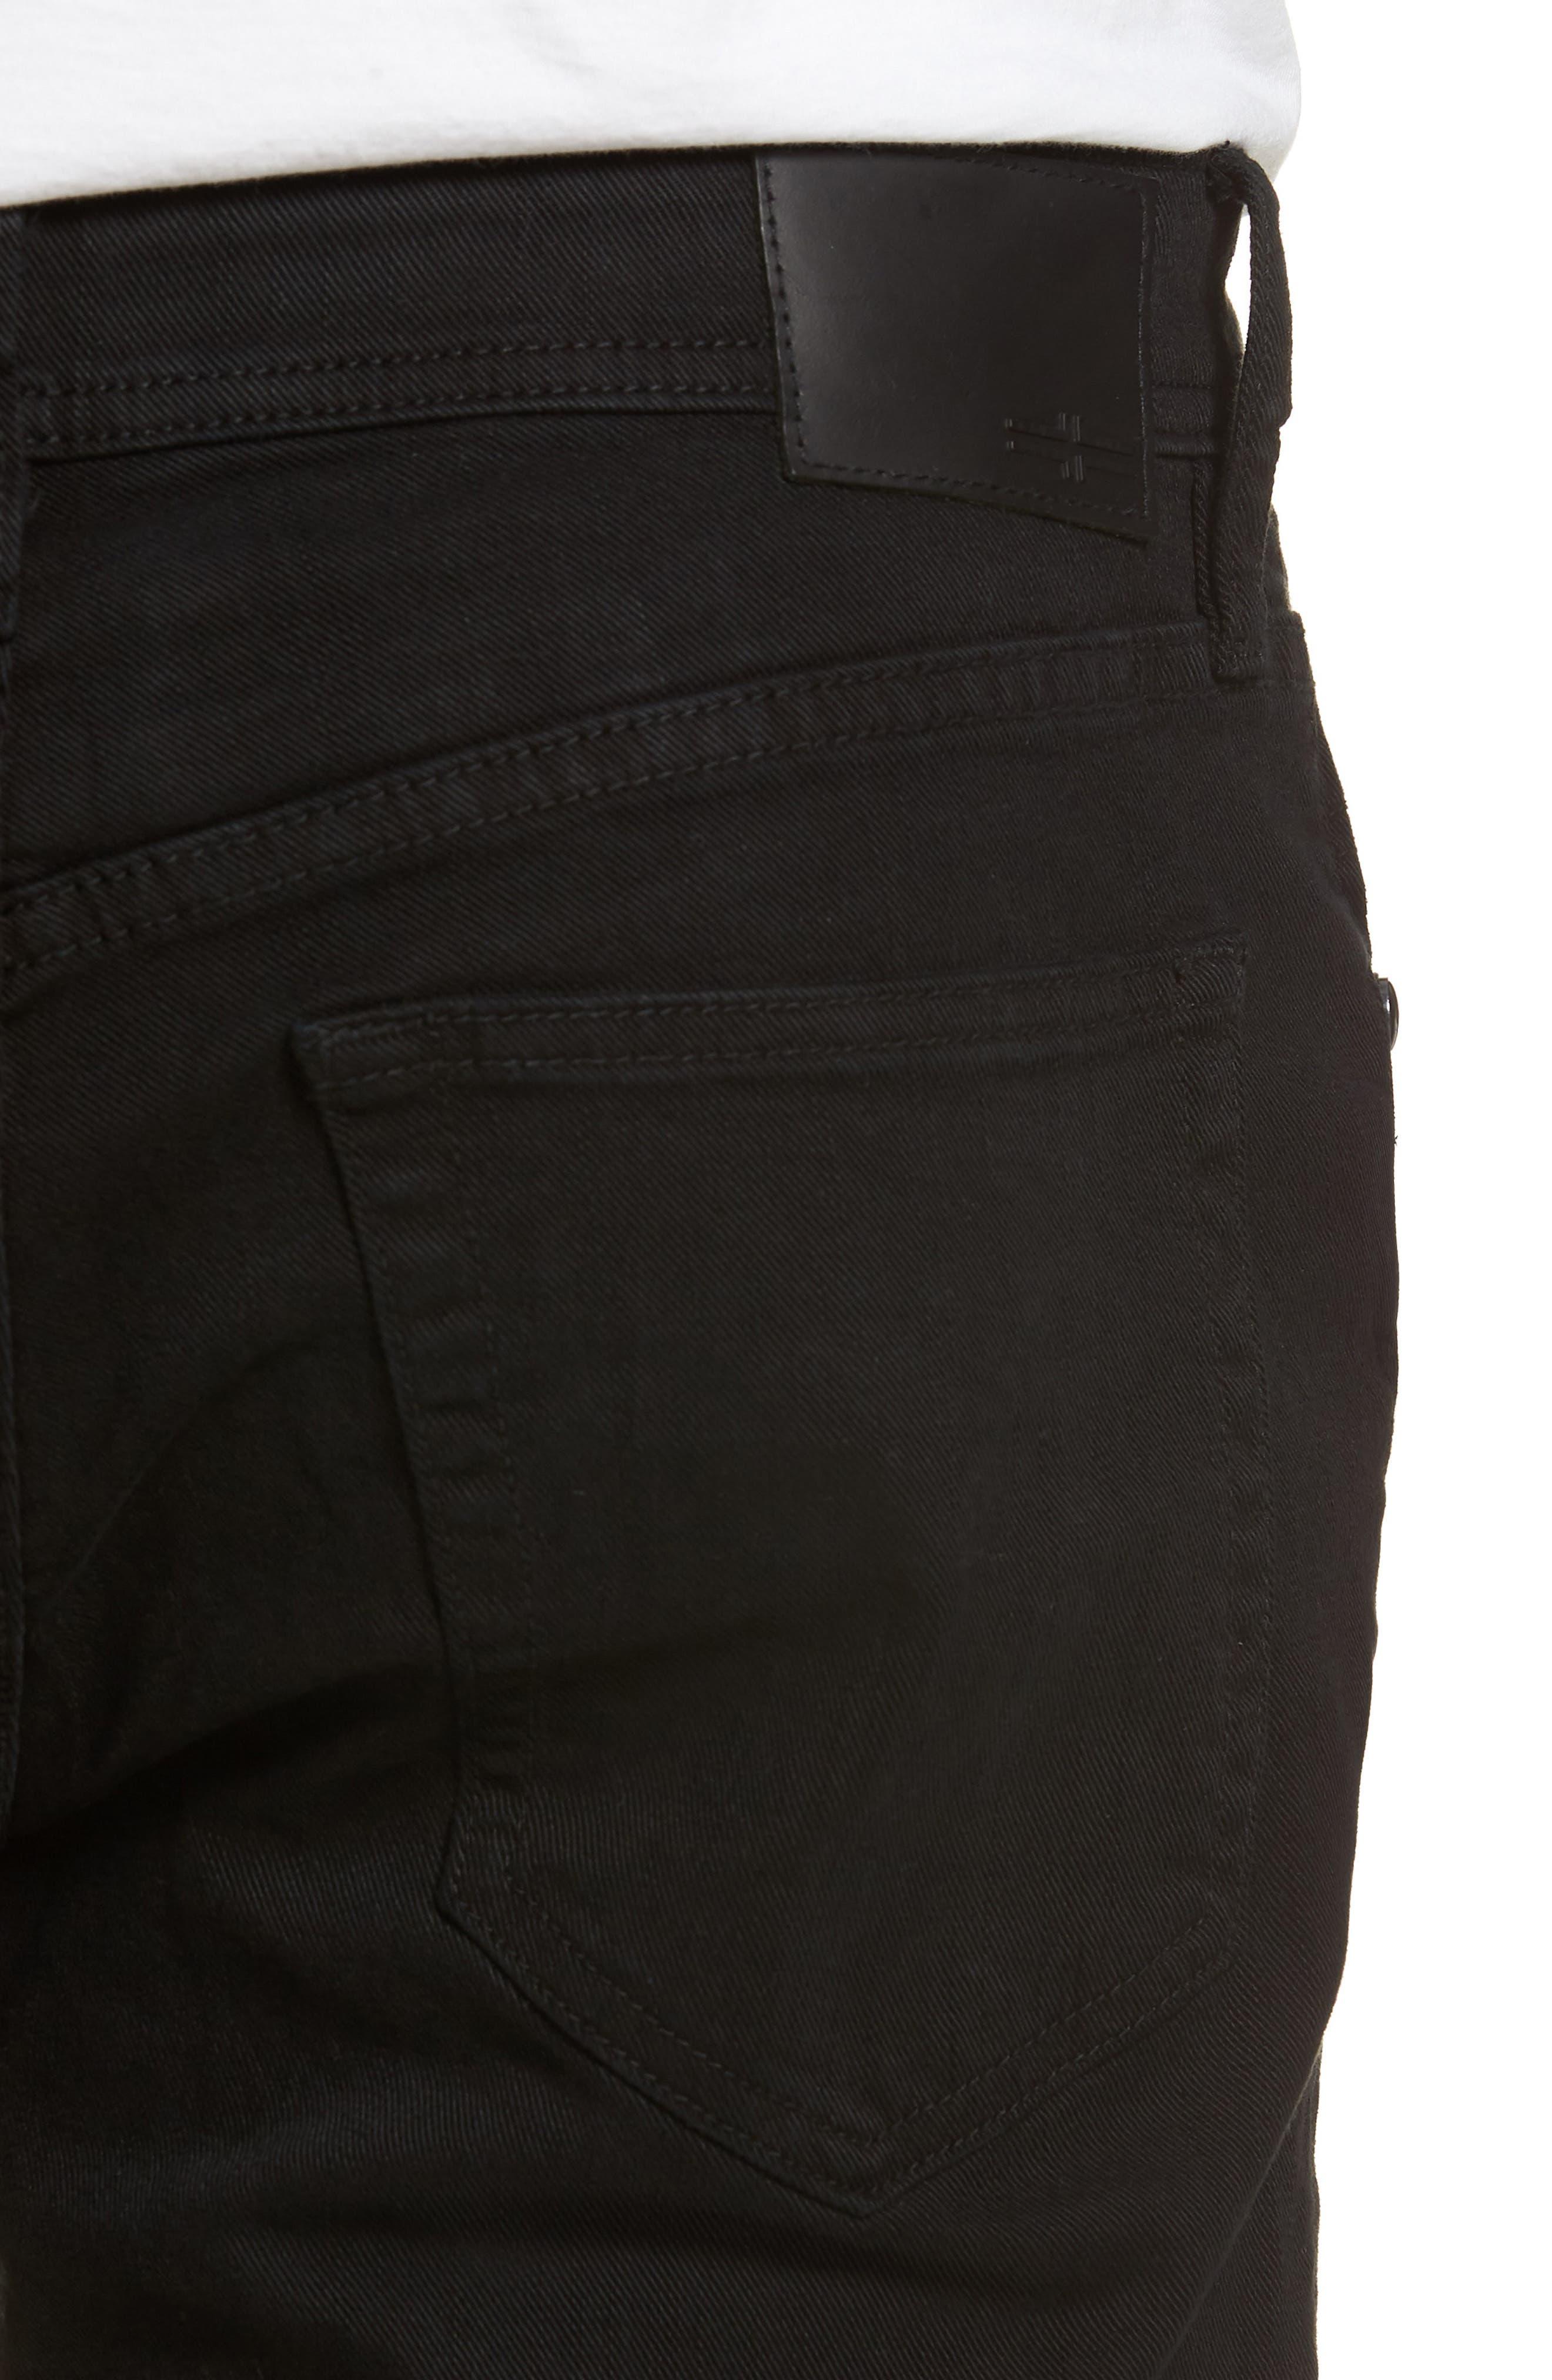 Jeans Co. Kingston Slim Straight Leg Jeans,                             Alternate thumbnail 4, color,                             Black Rinse